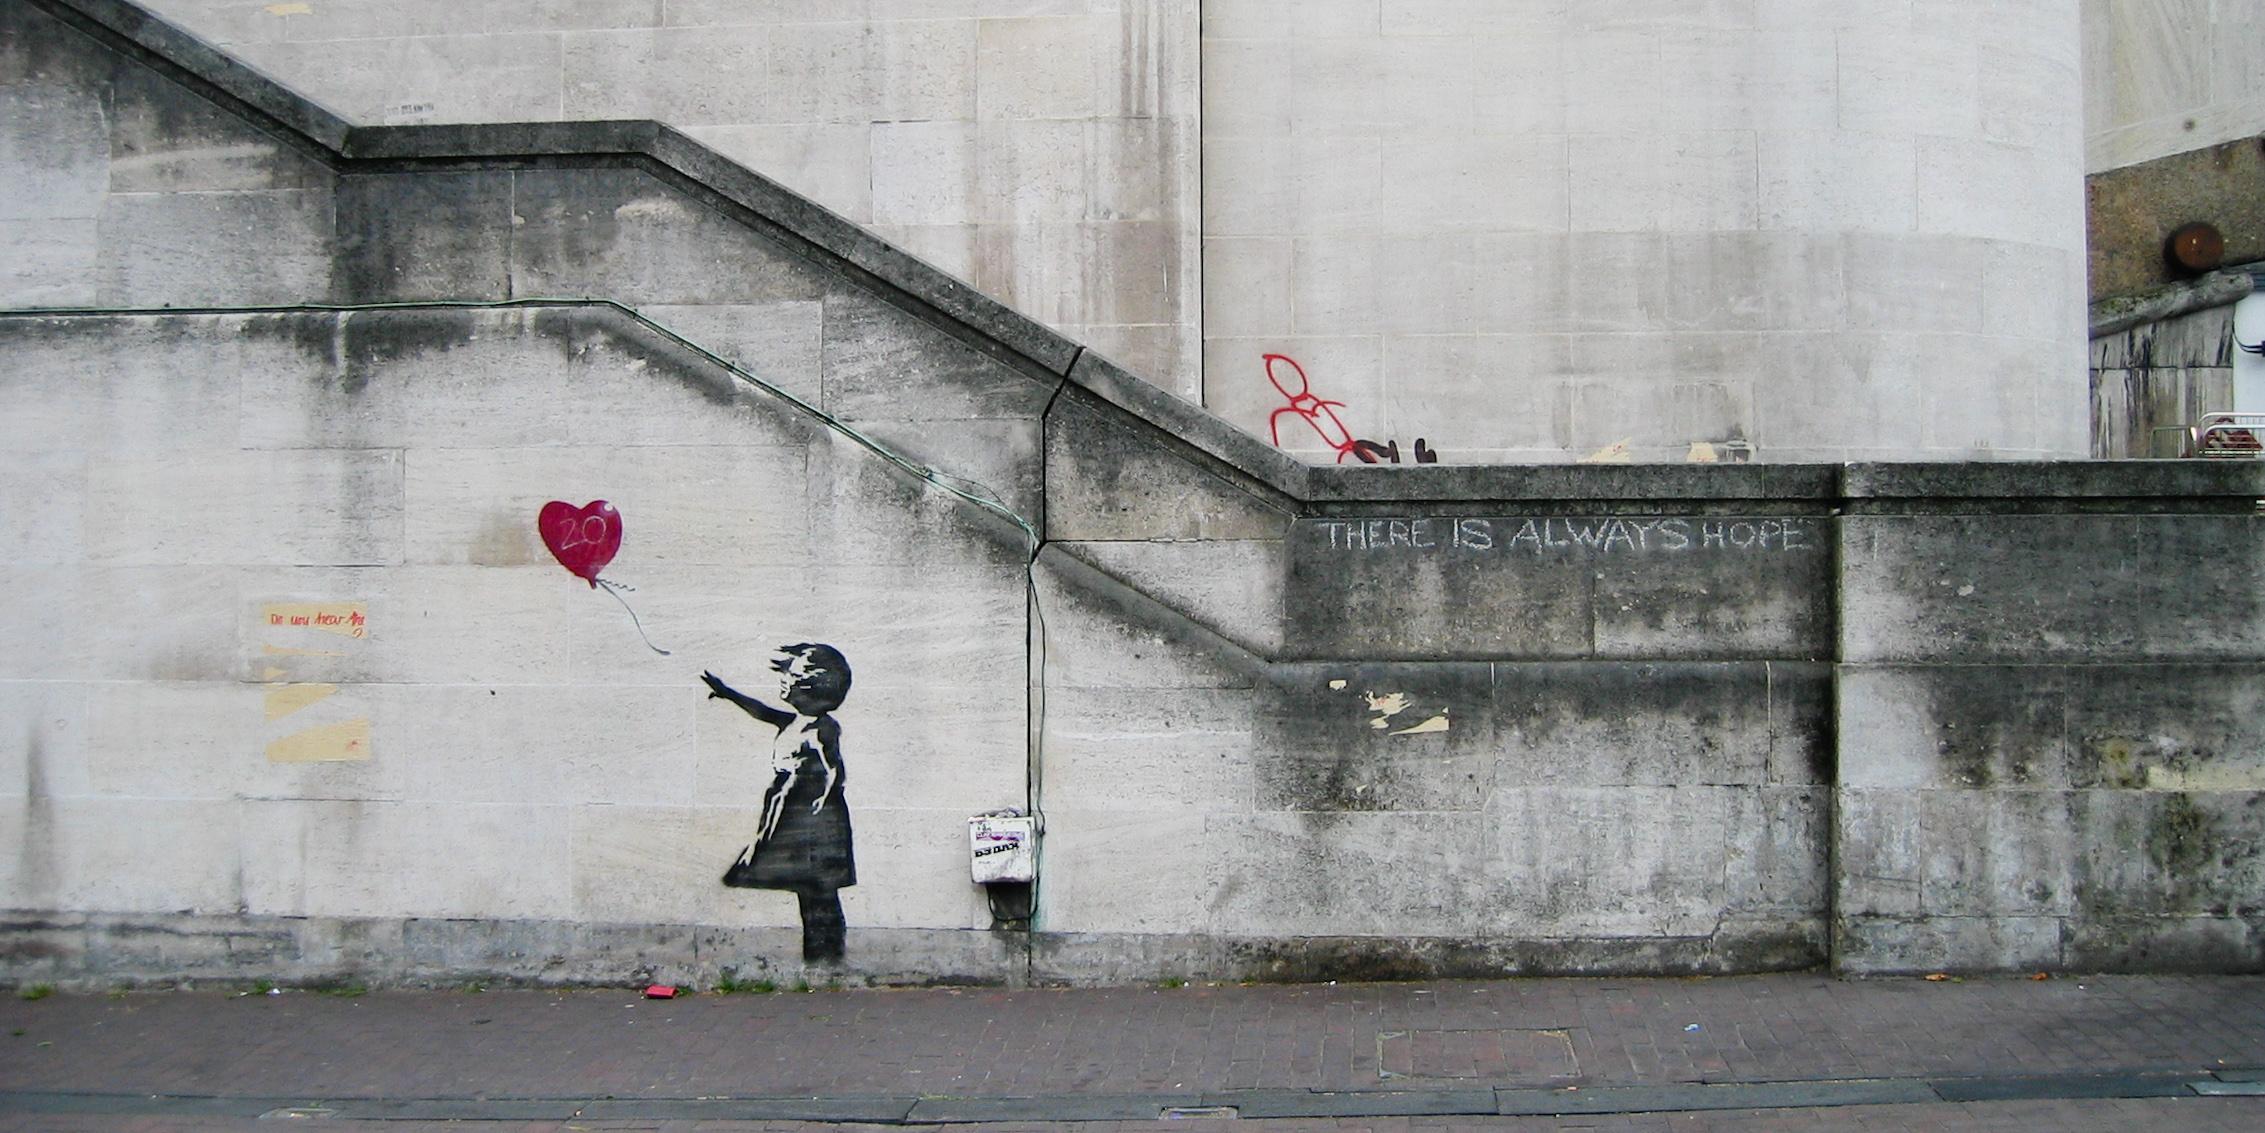 Banksy Hd Wallpaper: Banksy Wallpaper Hd